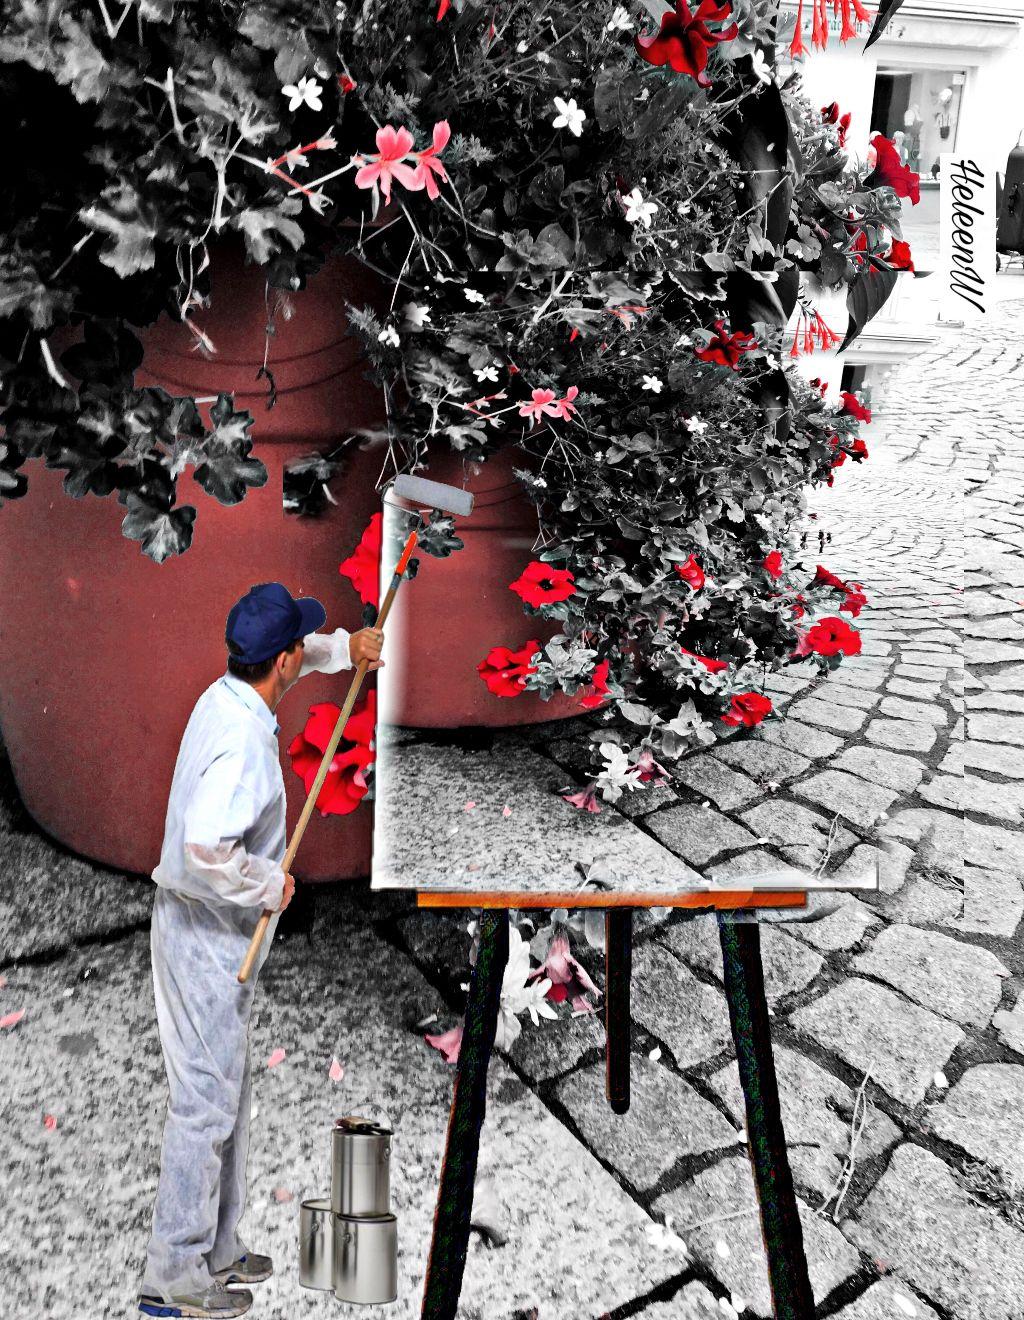 #surreal #surrealism #painter #flowers #streetart #madewithpicsart #myedit #myart #mystyle #cityart #interesting #colored #fantasy #imagination #freetoedit